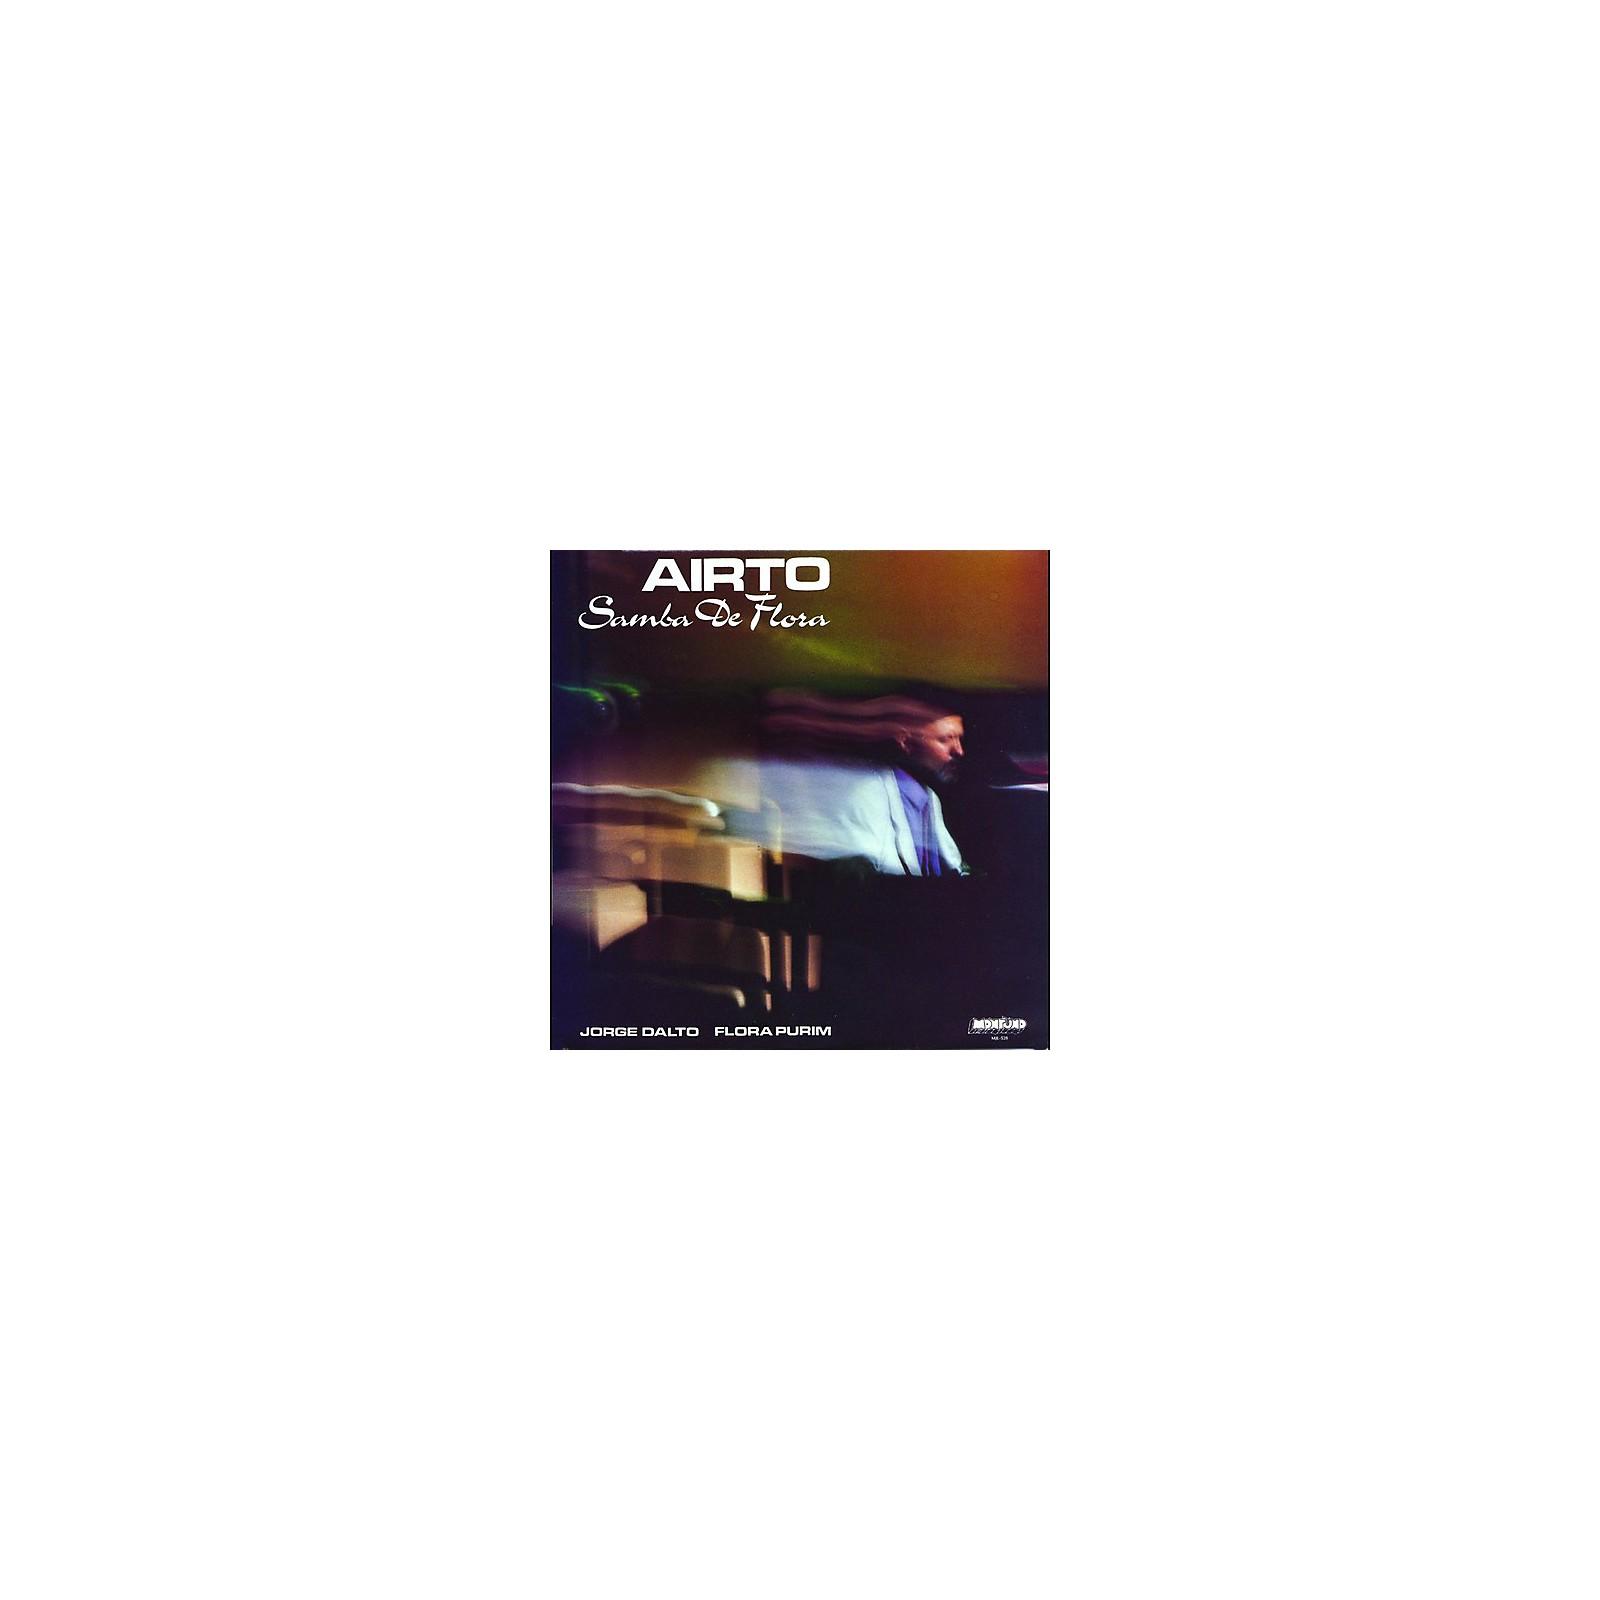 Alliance Airto - Soul Jazz Records Presents Airto: Samba De Flora